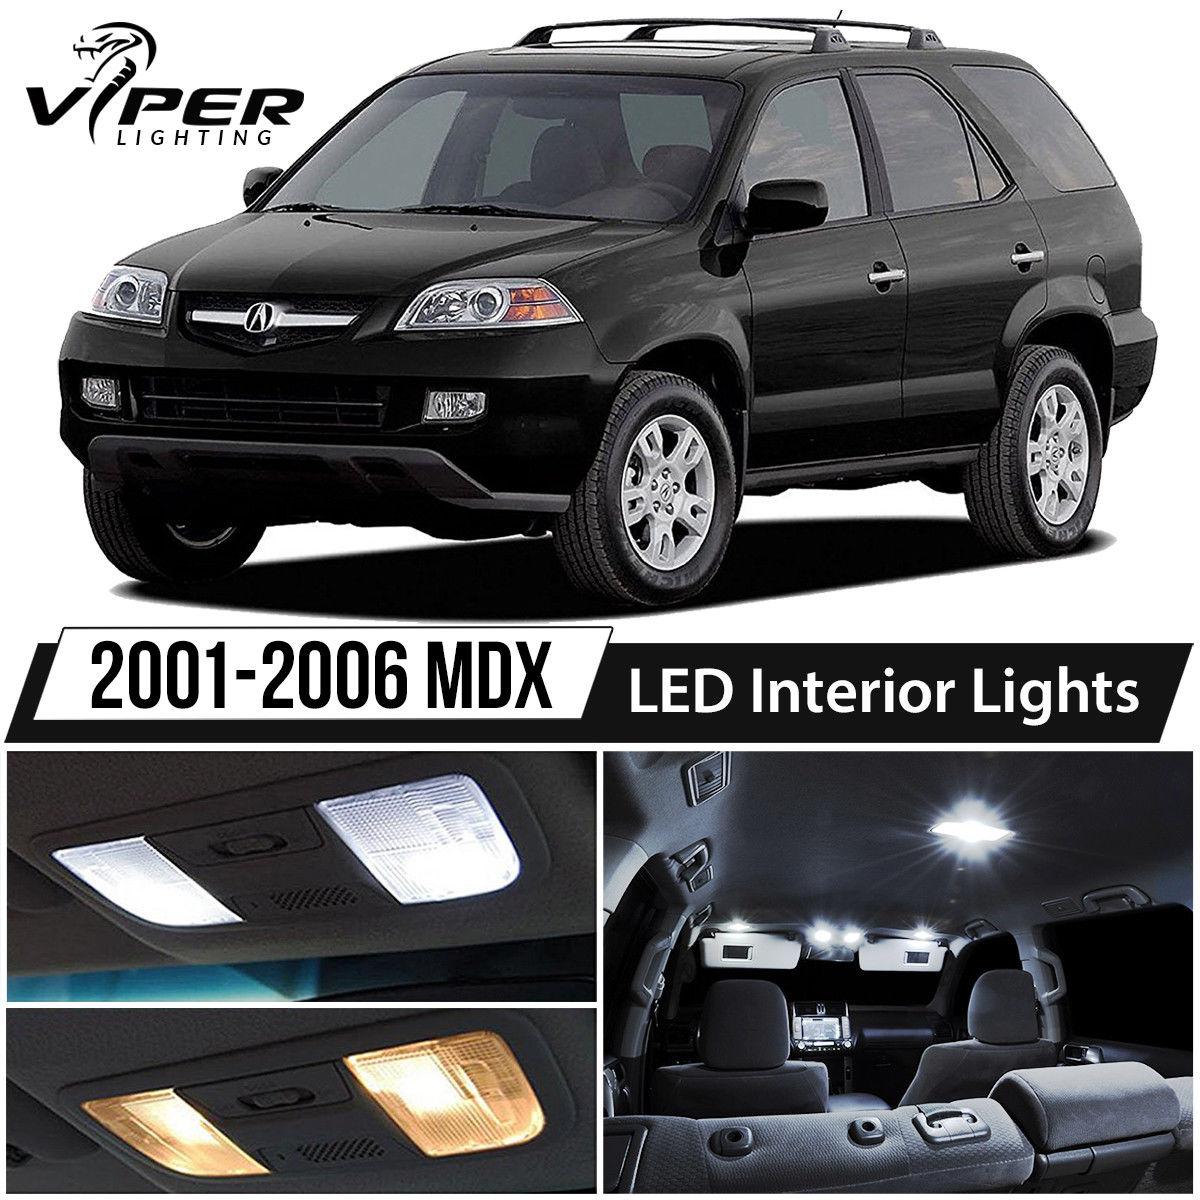 Awesome 2001-2006 Acura MDX White LED Interior Lights Kit